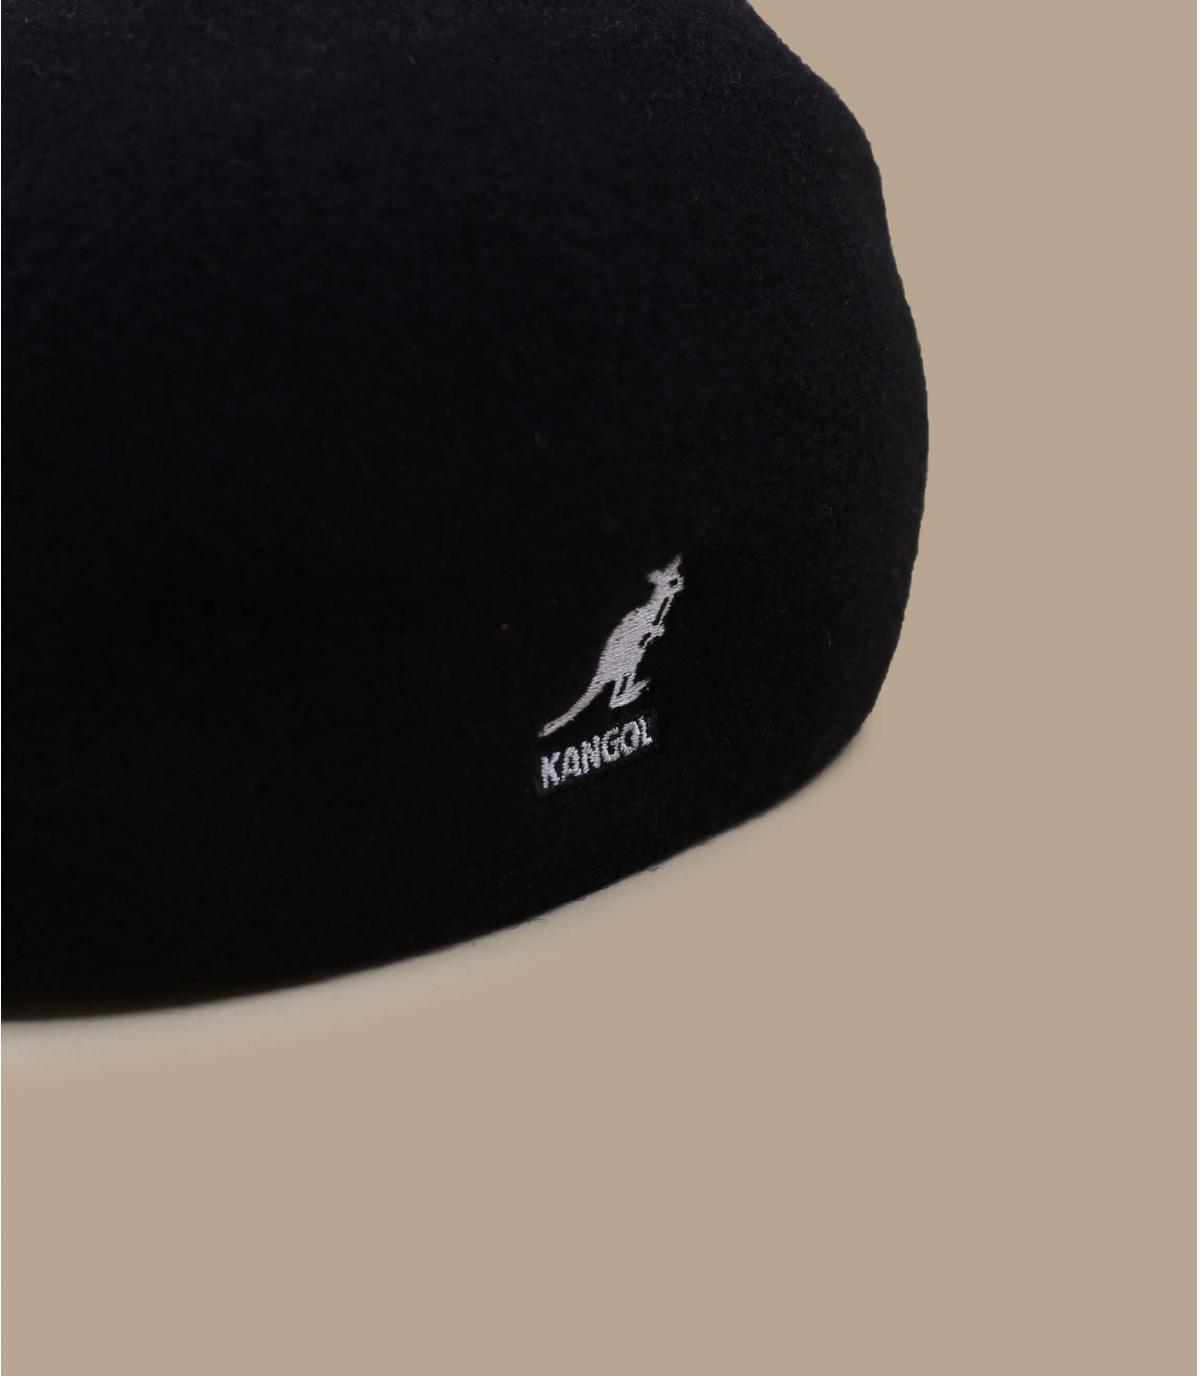 Détails 507 wool seamless noir - image 2